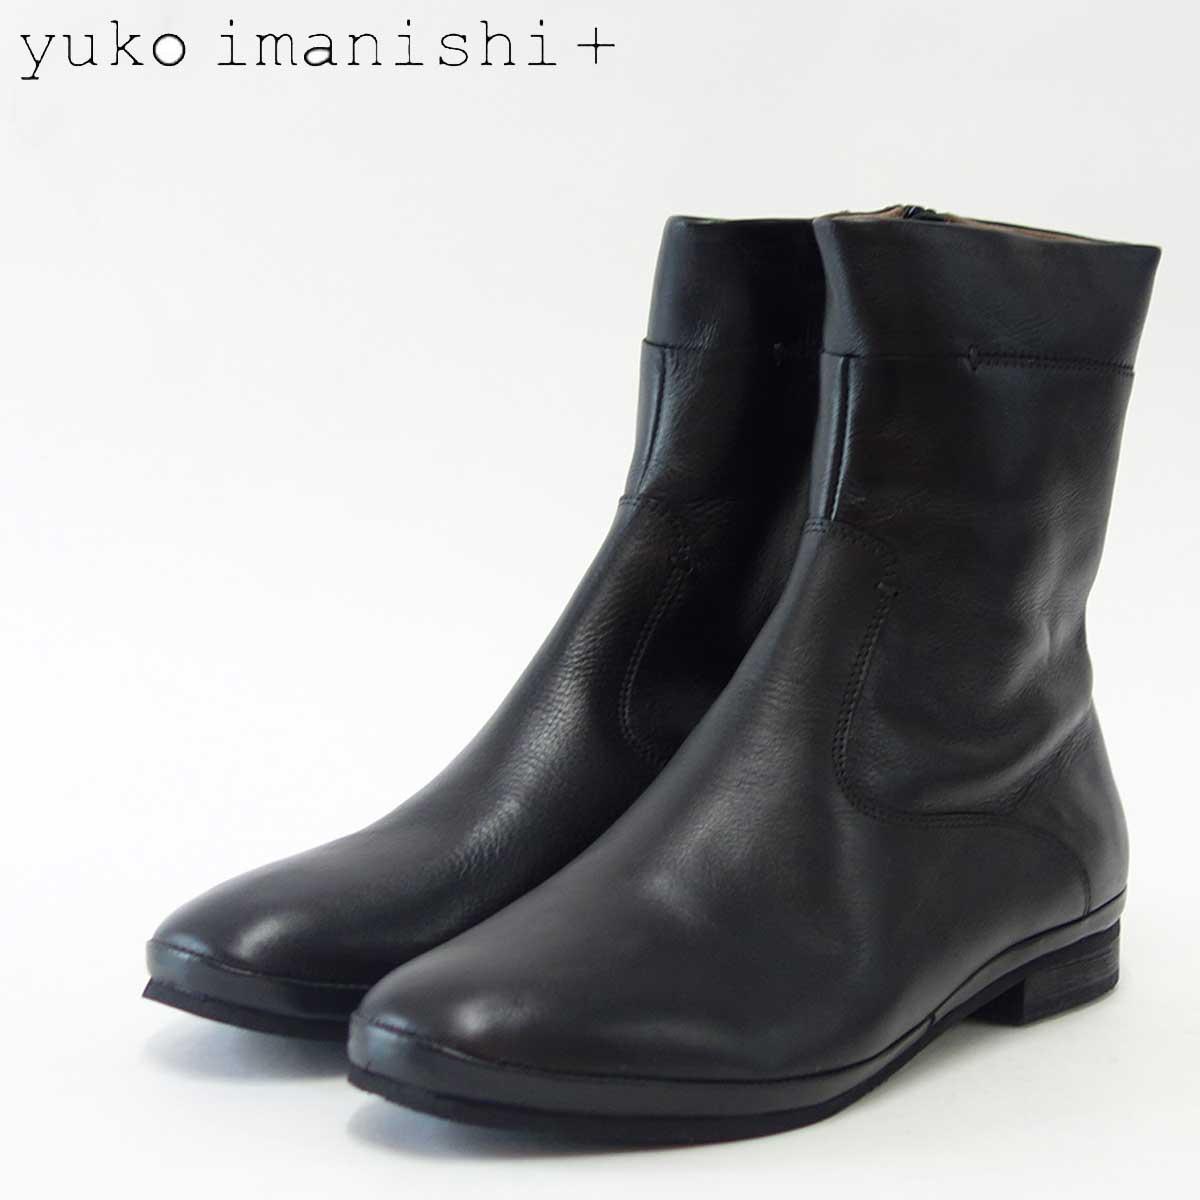 yuko imanishi + (ユーコイマニシ+) 77714 ブラック上質天然皮革のサイドファスナーブーツ「靴」